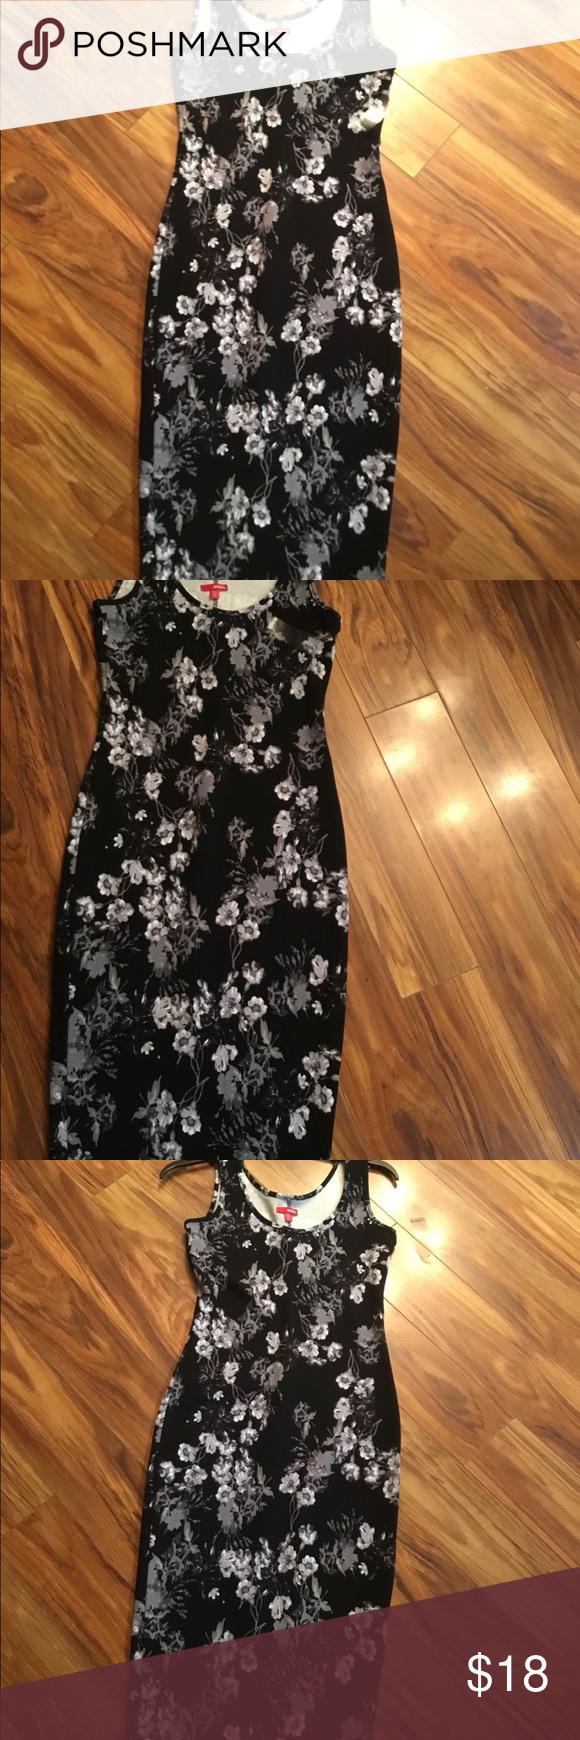 Bongo Below The Knee Sleeveless Dress Pretty Black Dresses Dresses Clothes Design [ 1740 x 580 Pixel ]